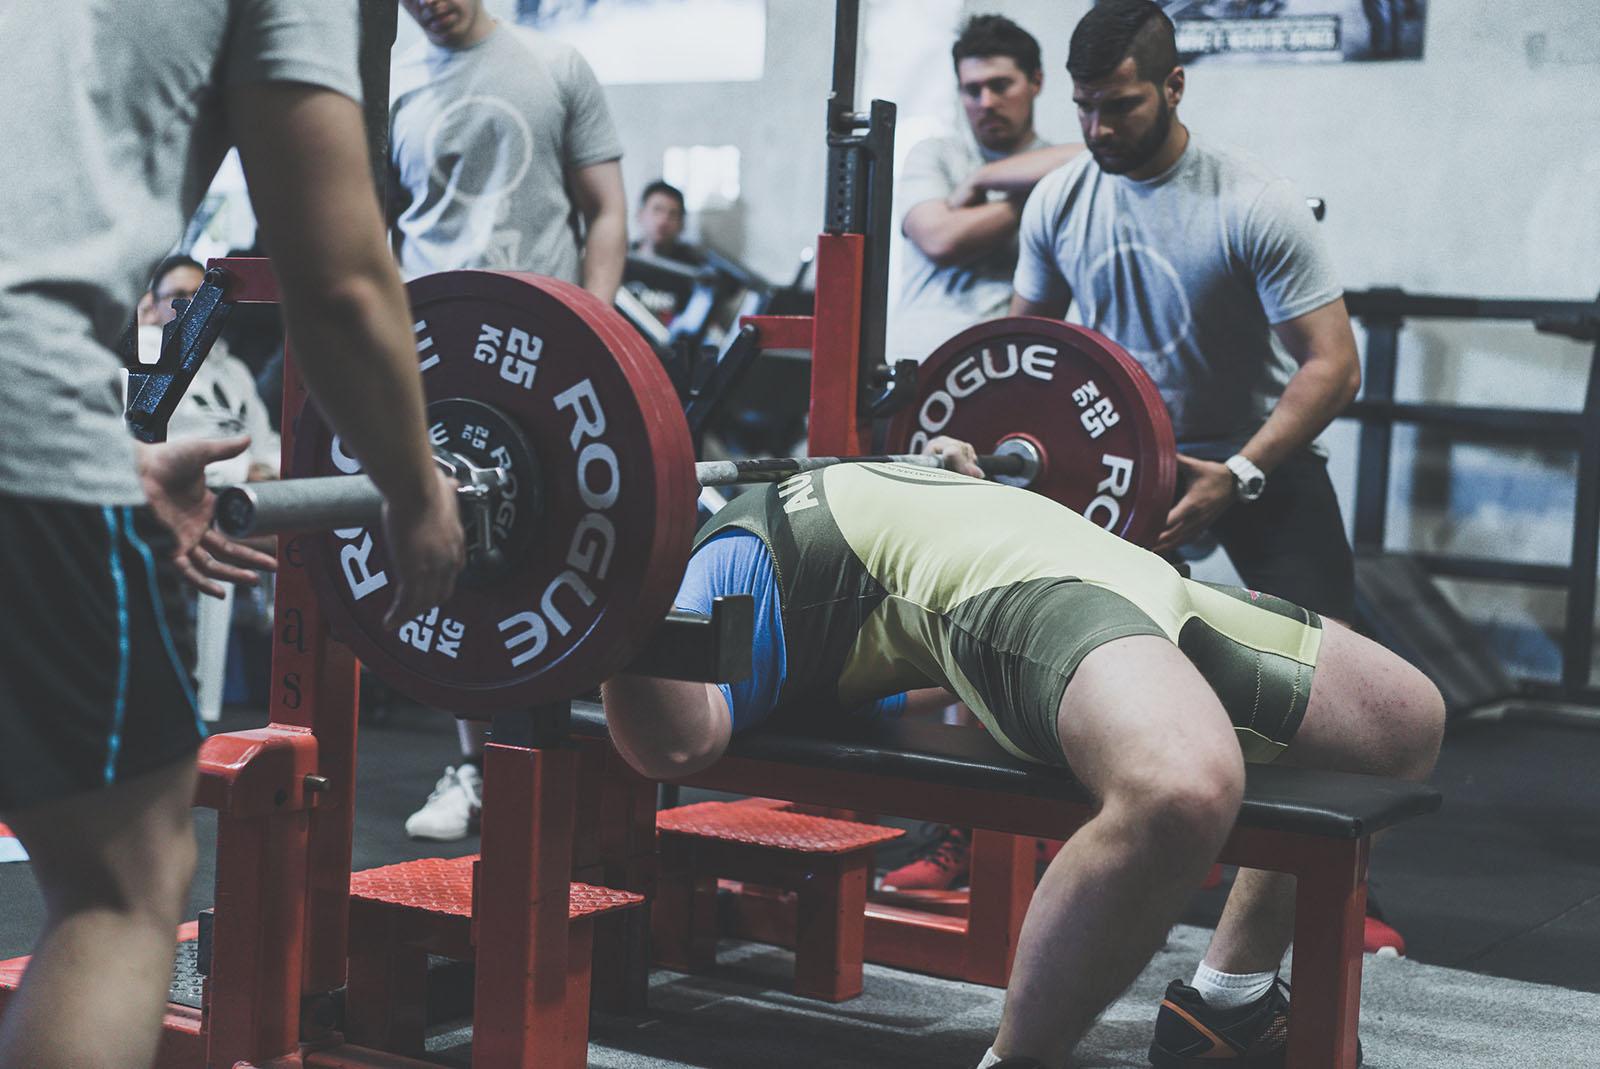 180kg bench press